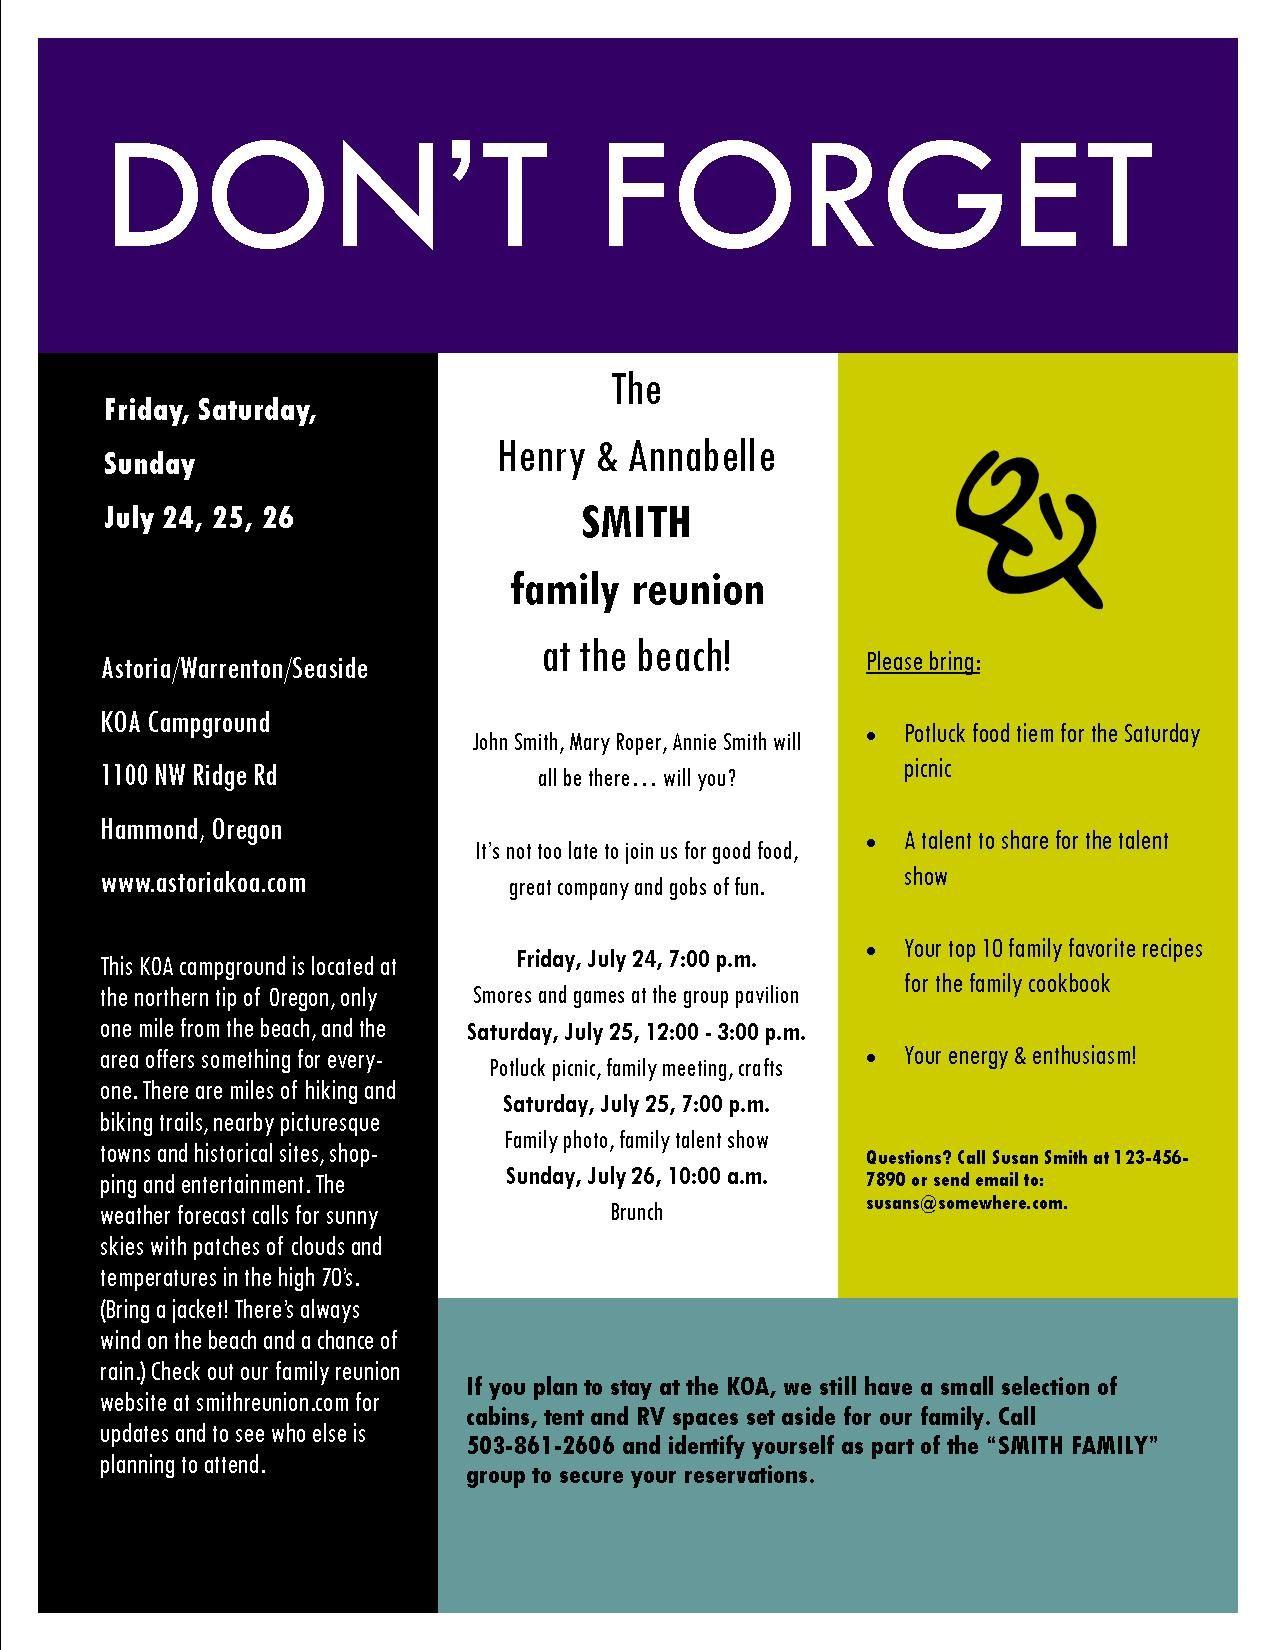 Sample family reunion invitation flyer Ideas for Family